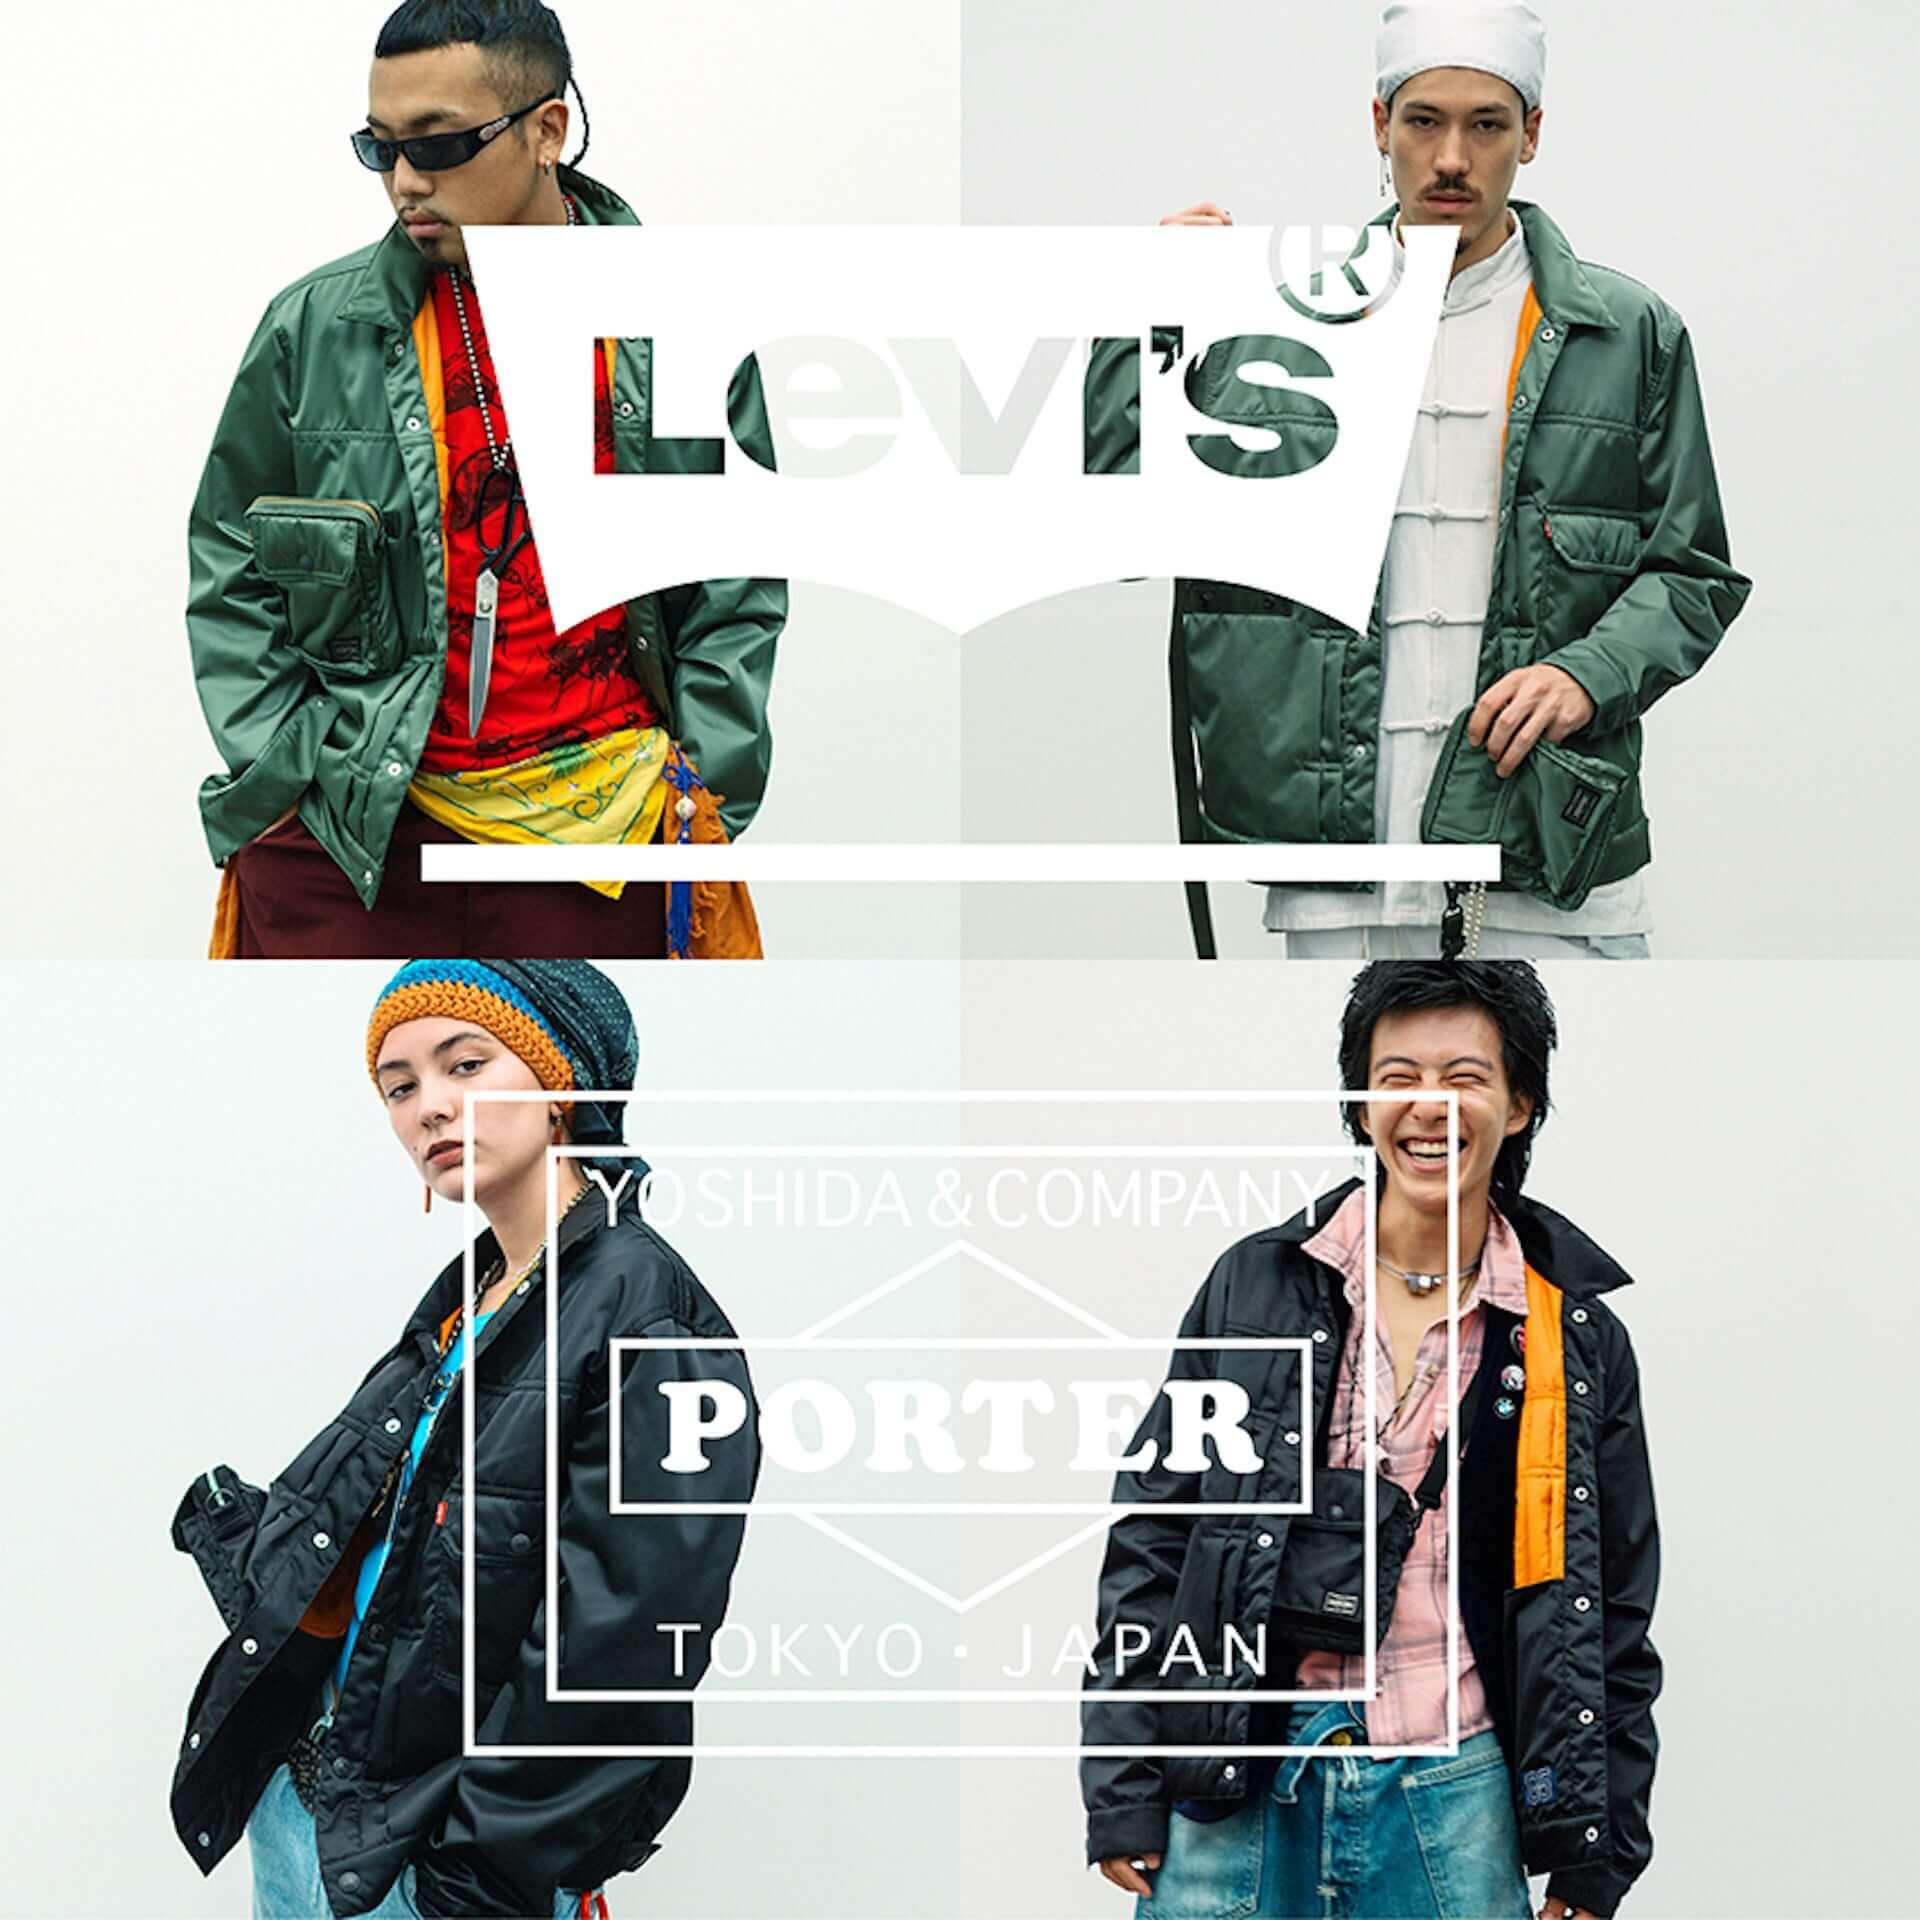 Levi's®︎とPORTERのコラボによる限定トラッカージャケットが発売決定!吉田カバン創業85周年記念モデル lf201020_levis-porter_5-1920x1920